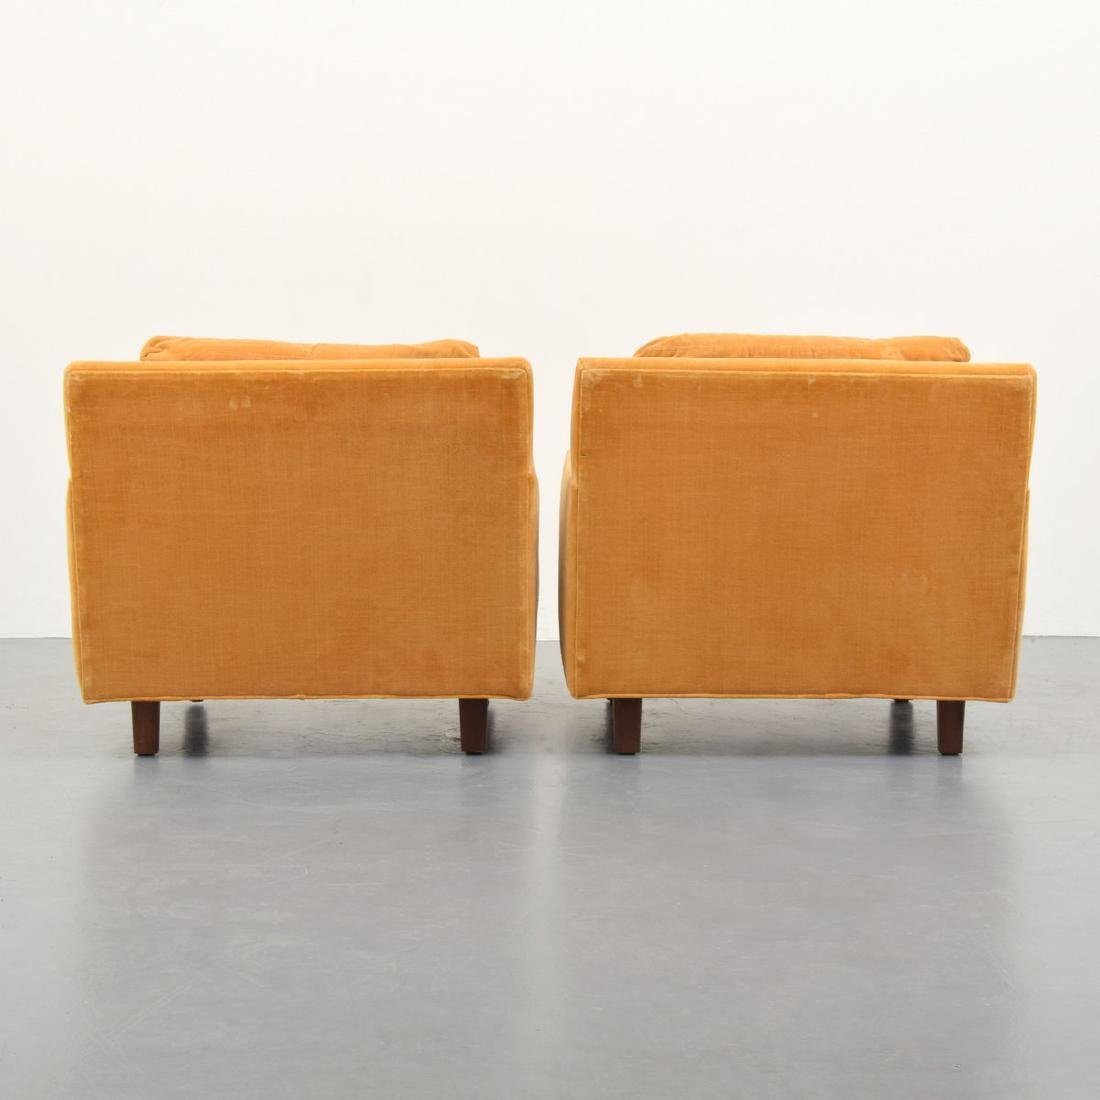 Pair of Milo Baughman Lounge Chairs - 3